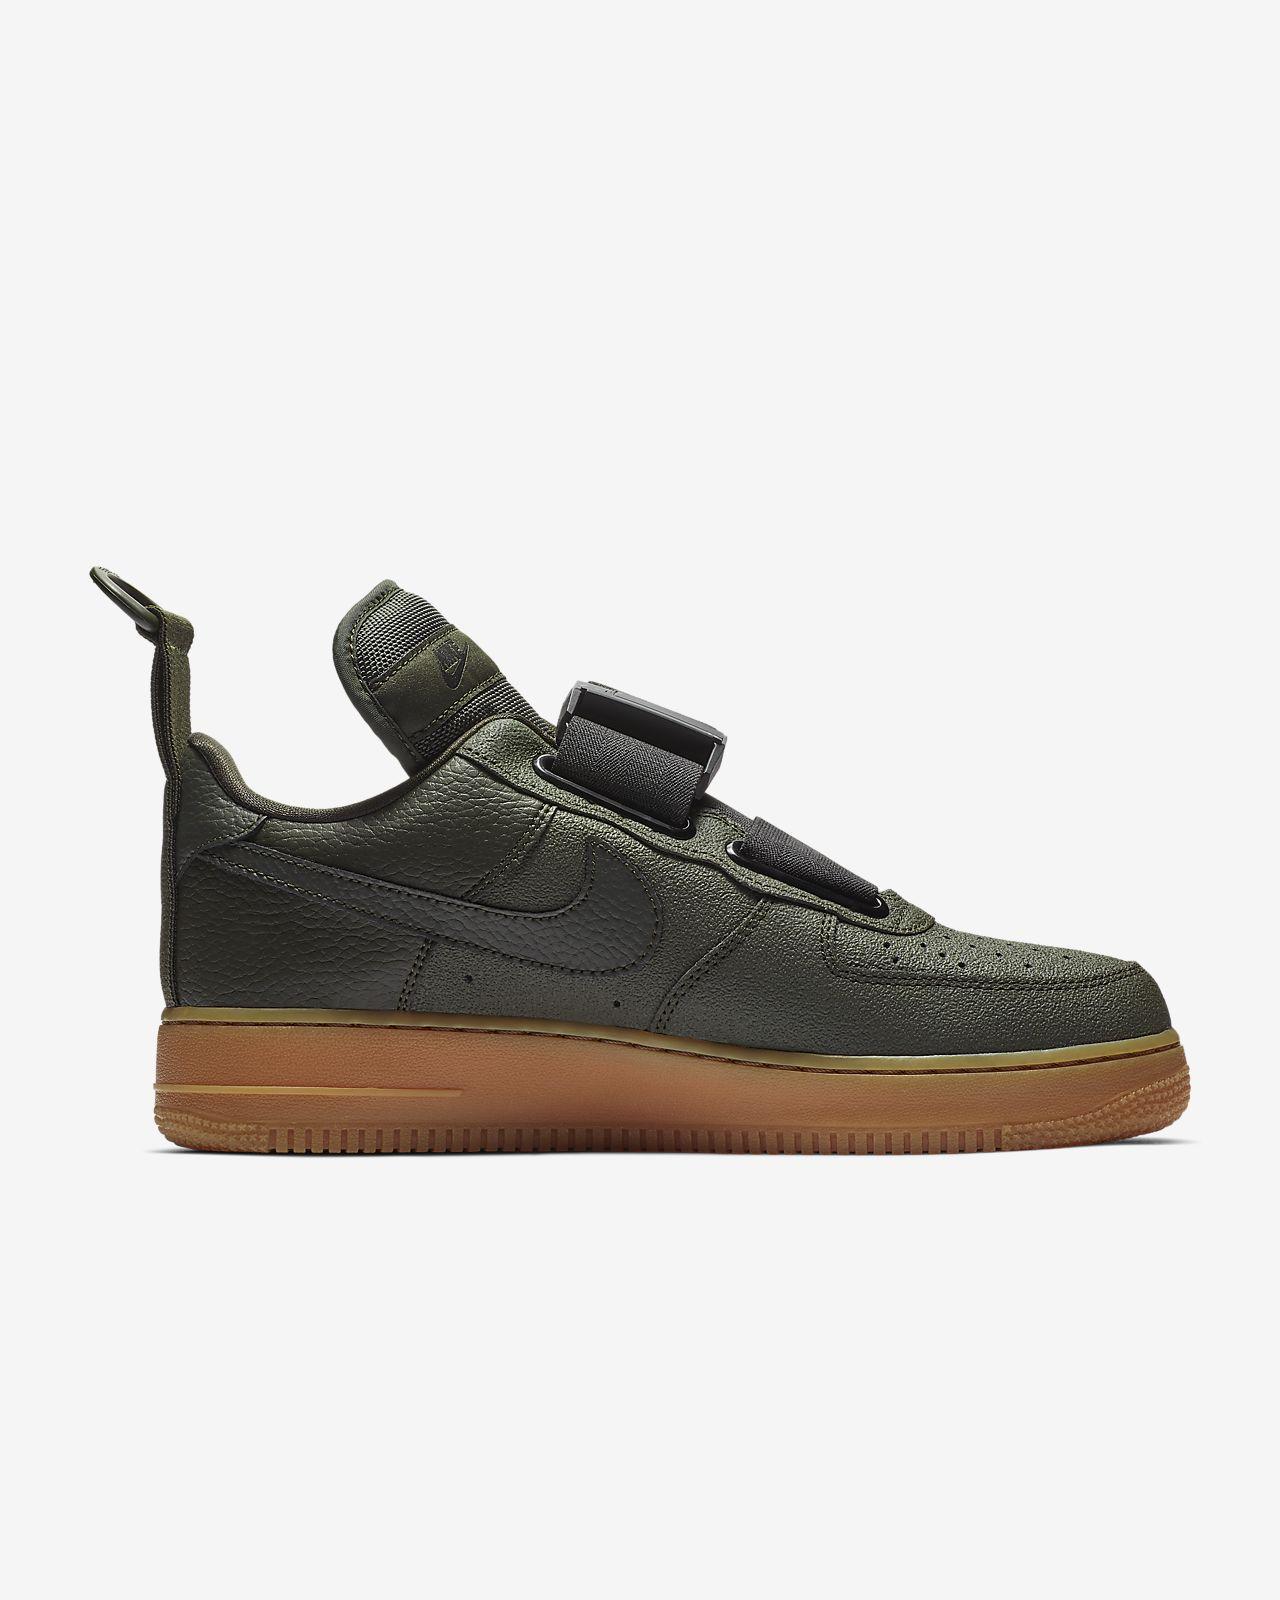 official photos bd63d 775a1 ... Sko Nike Air Force 1 Utility för män